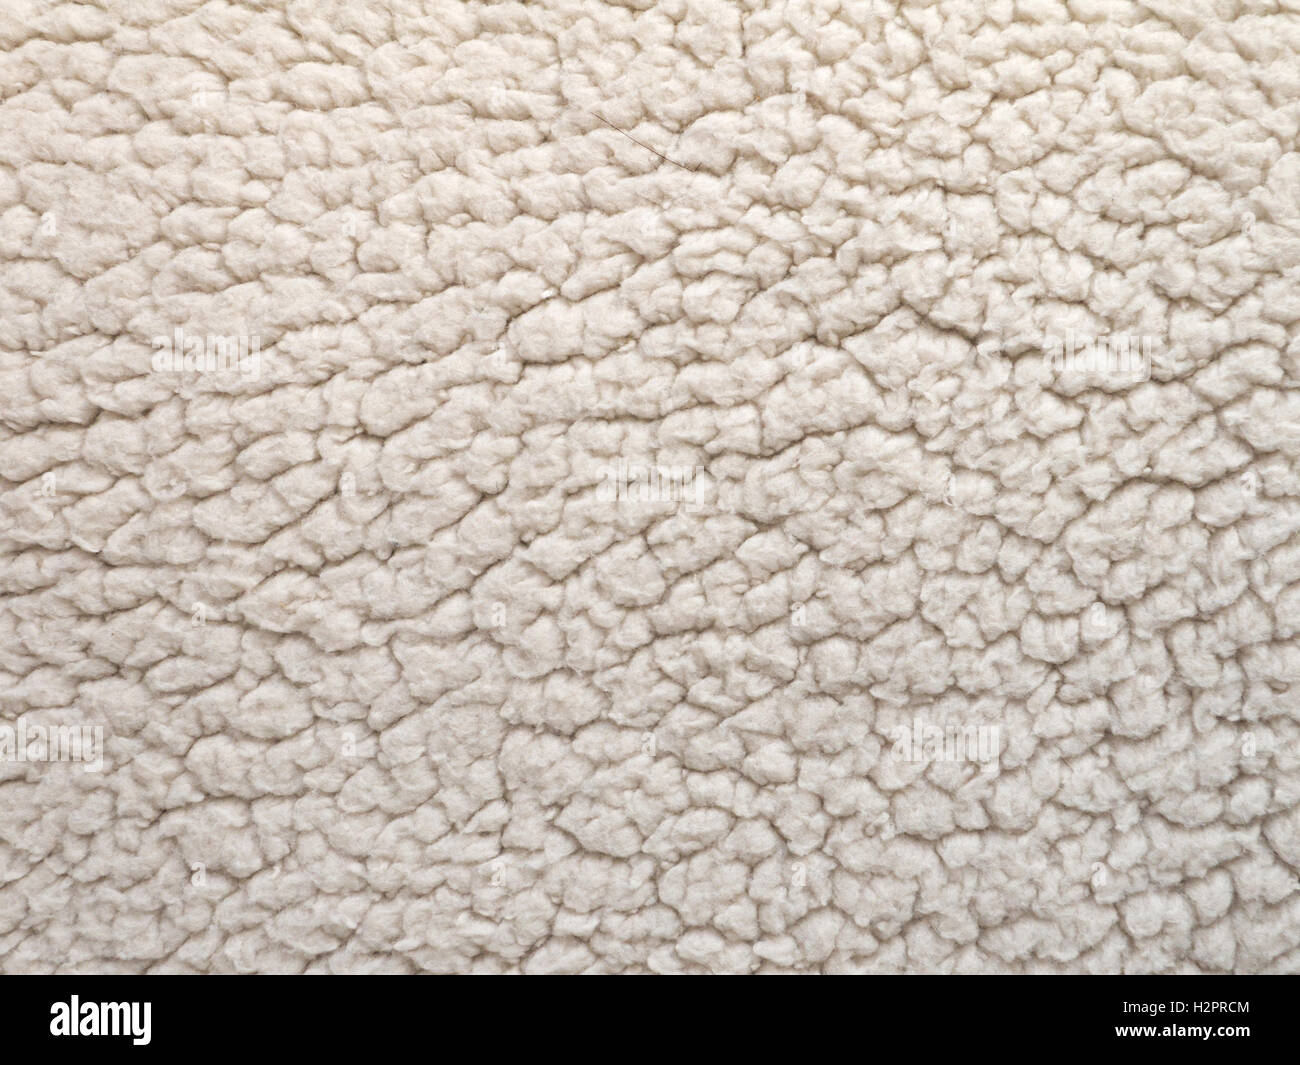 White Sheep Shearling Wool Background Stock Photo